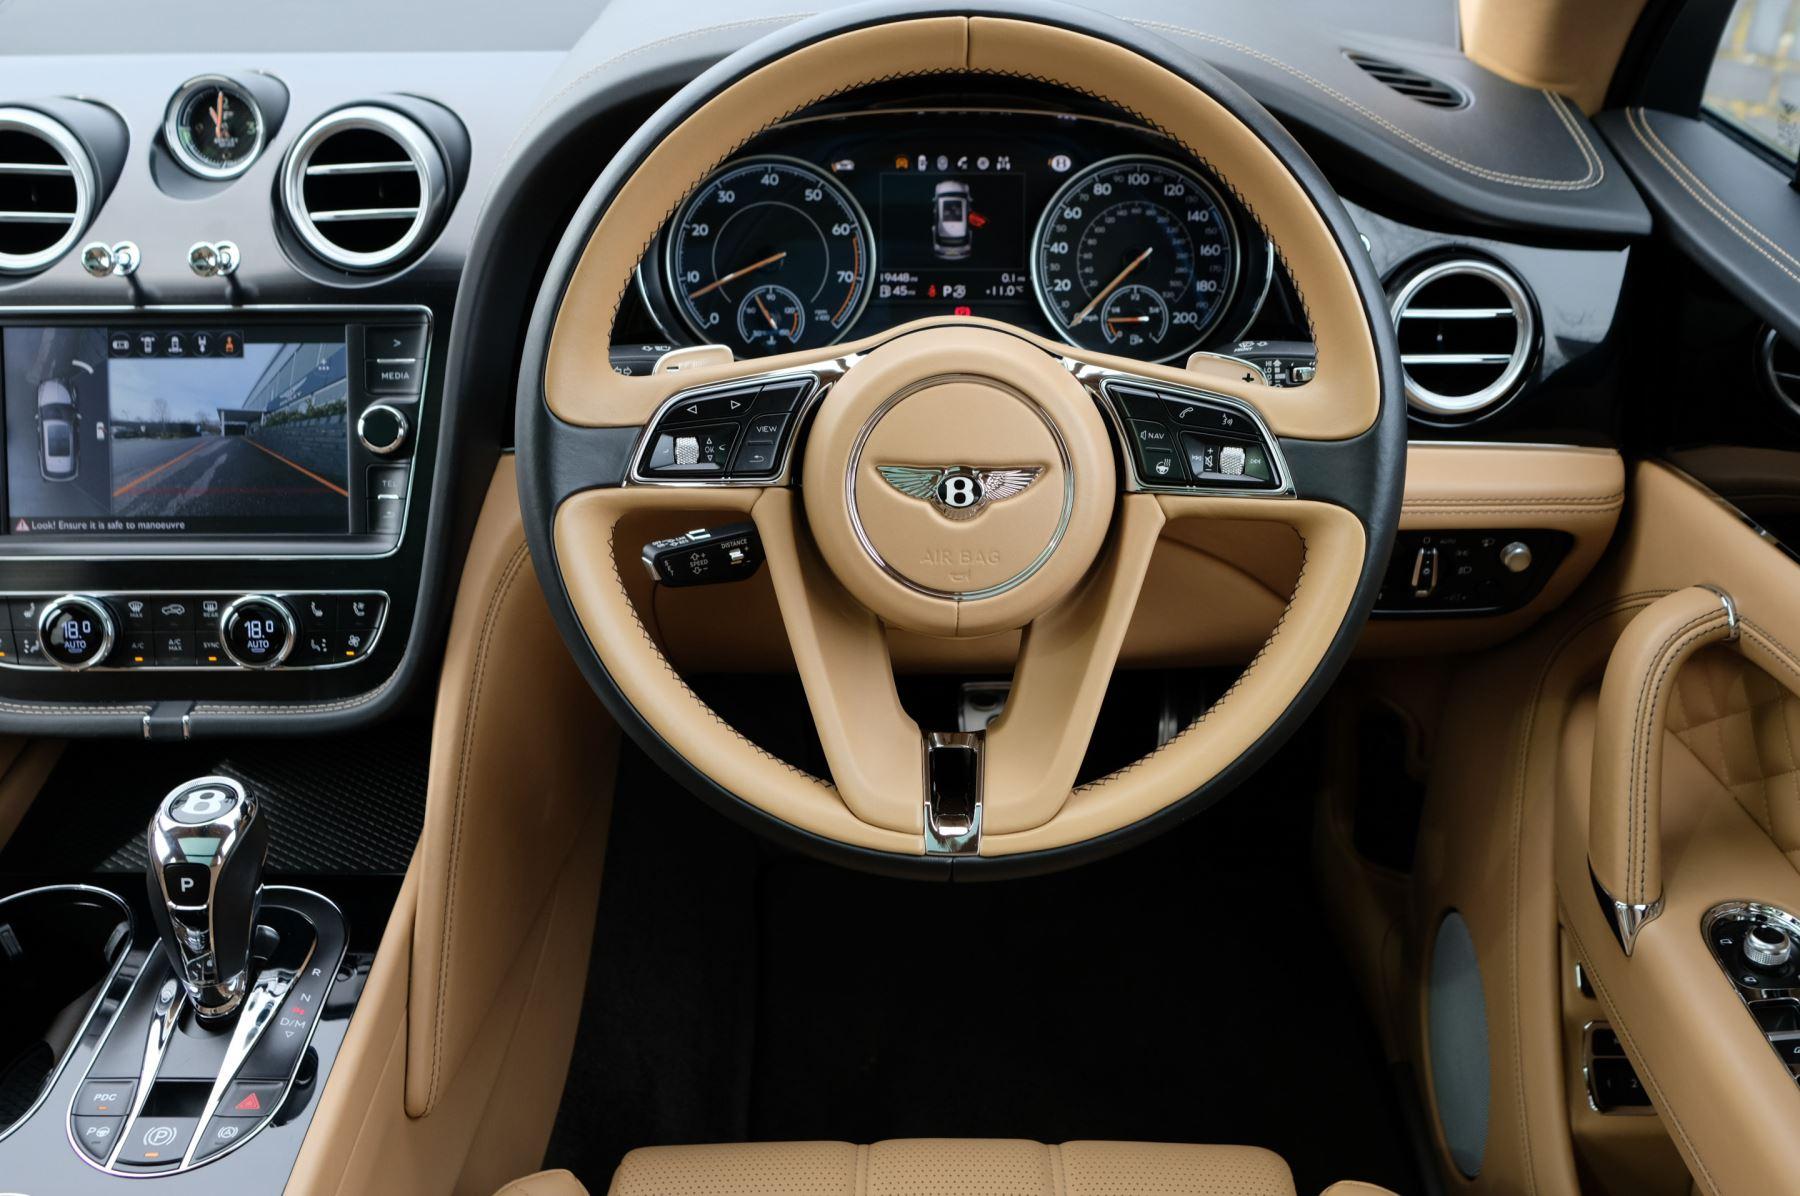 Bentley Bentayga 6.0 W12 5dr - Mulliner Driving Specification  image 15